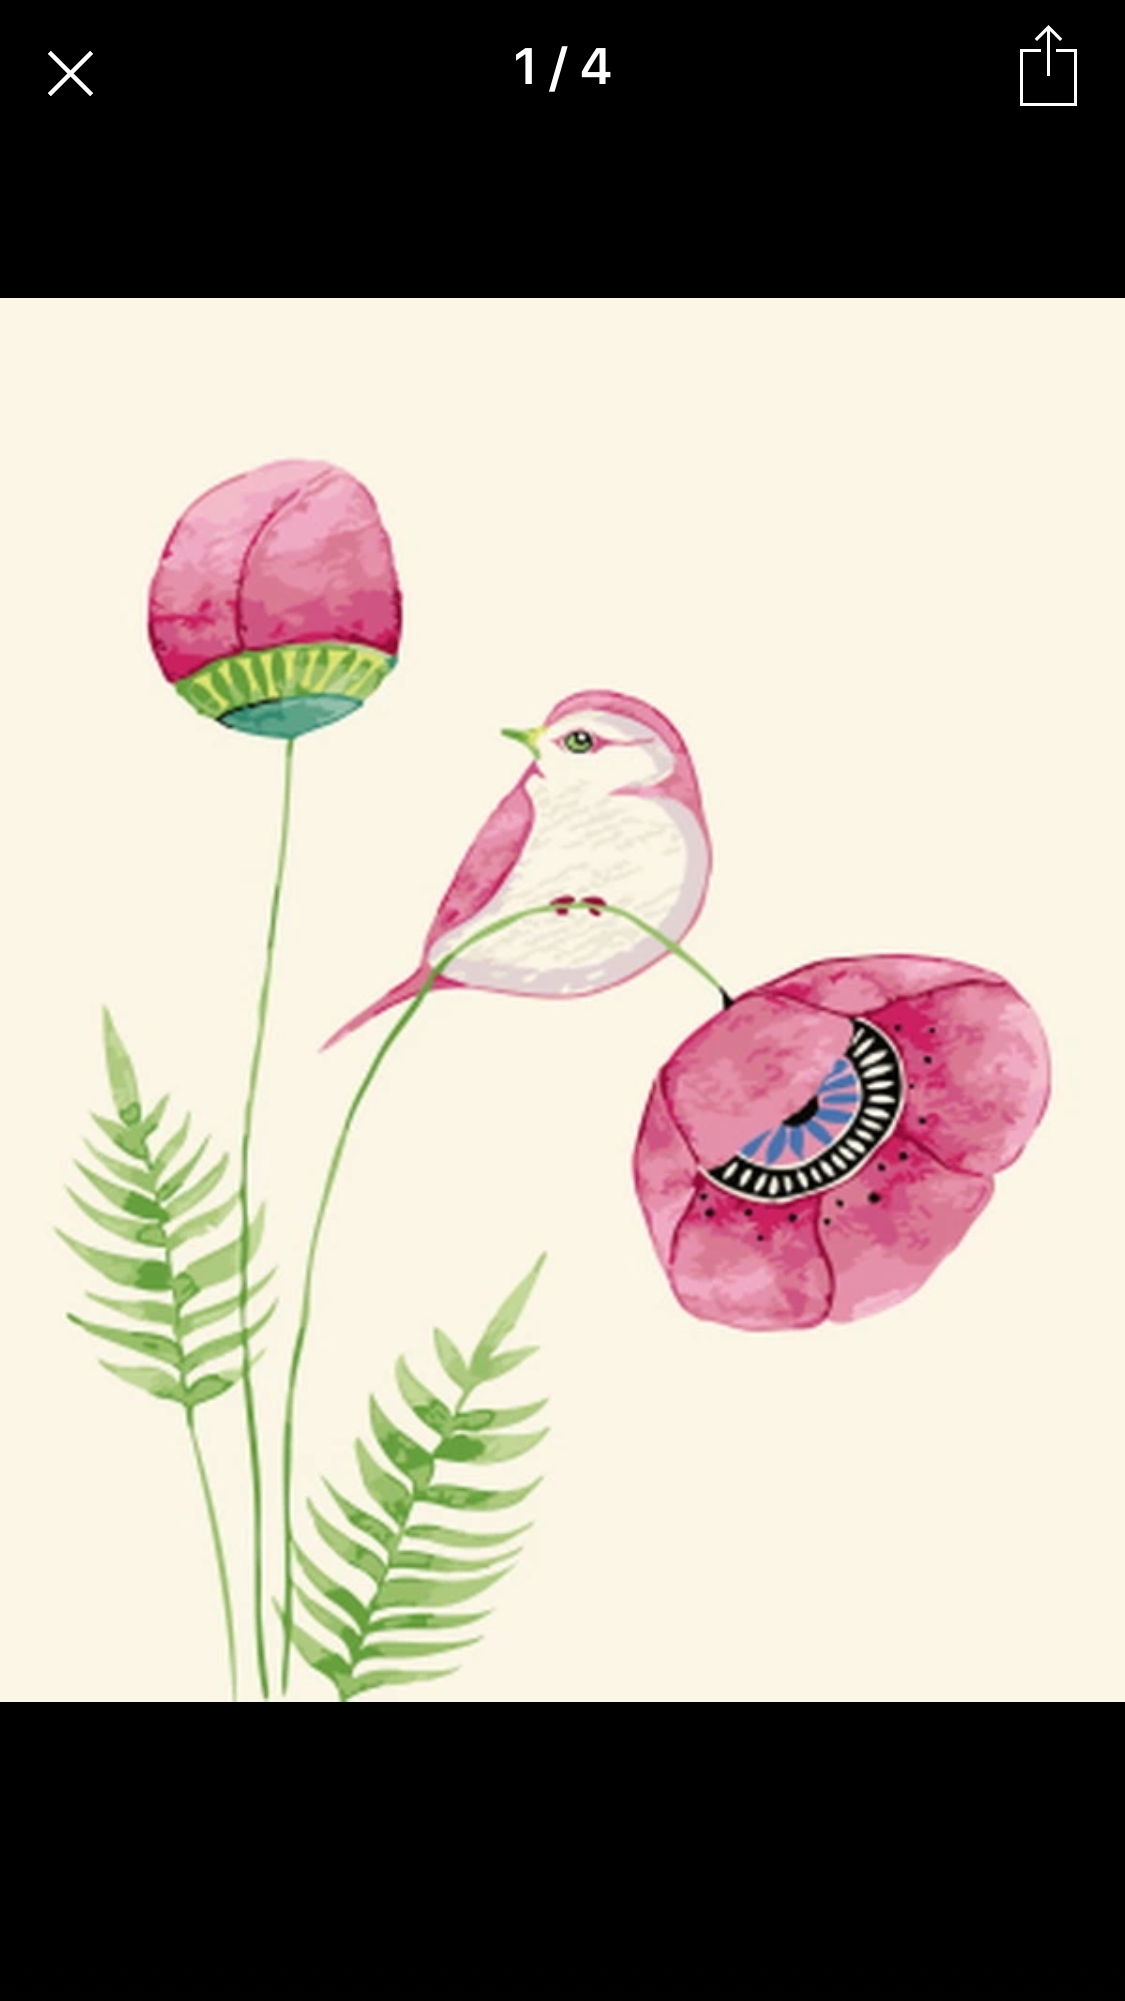 ideapatricia chinchilla on painting   bird art